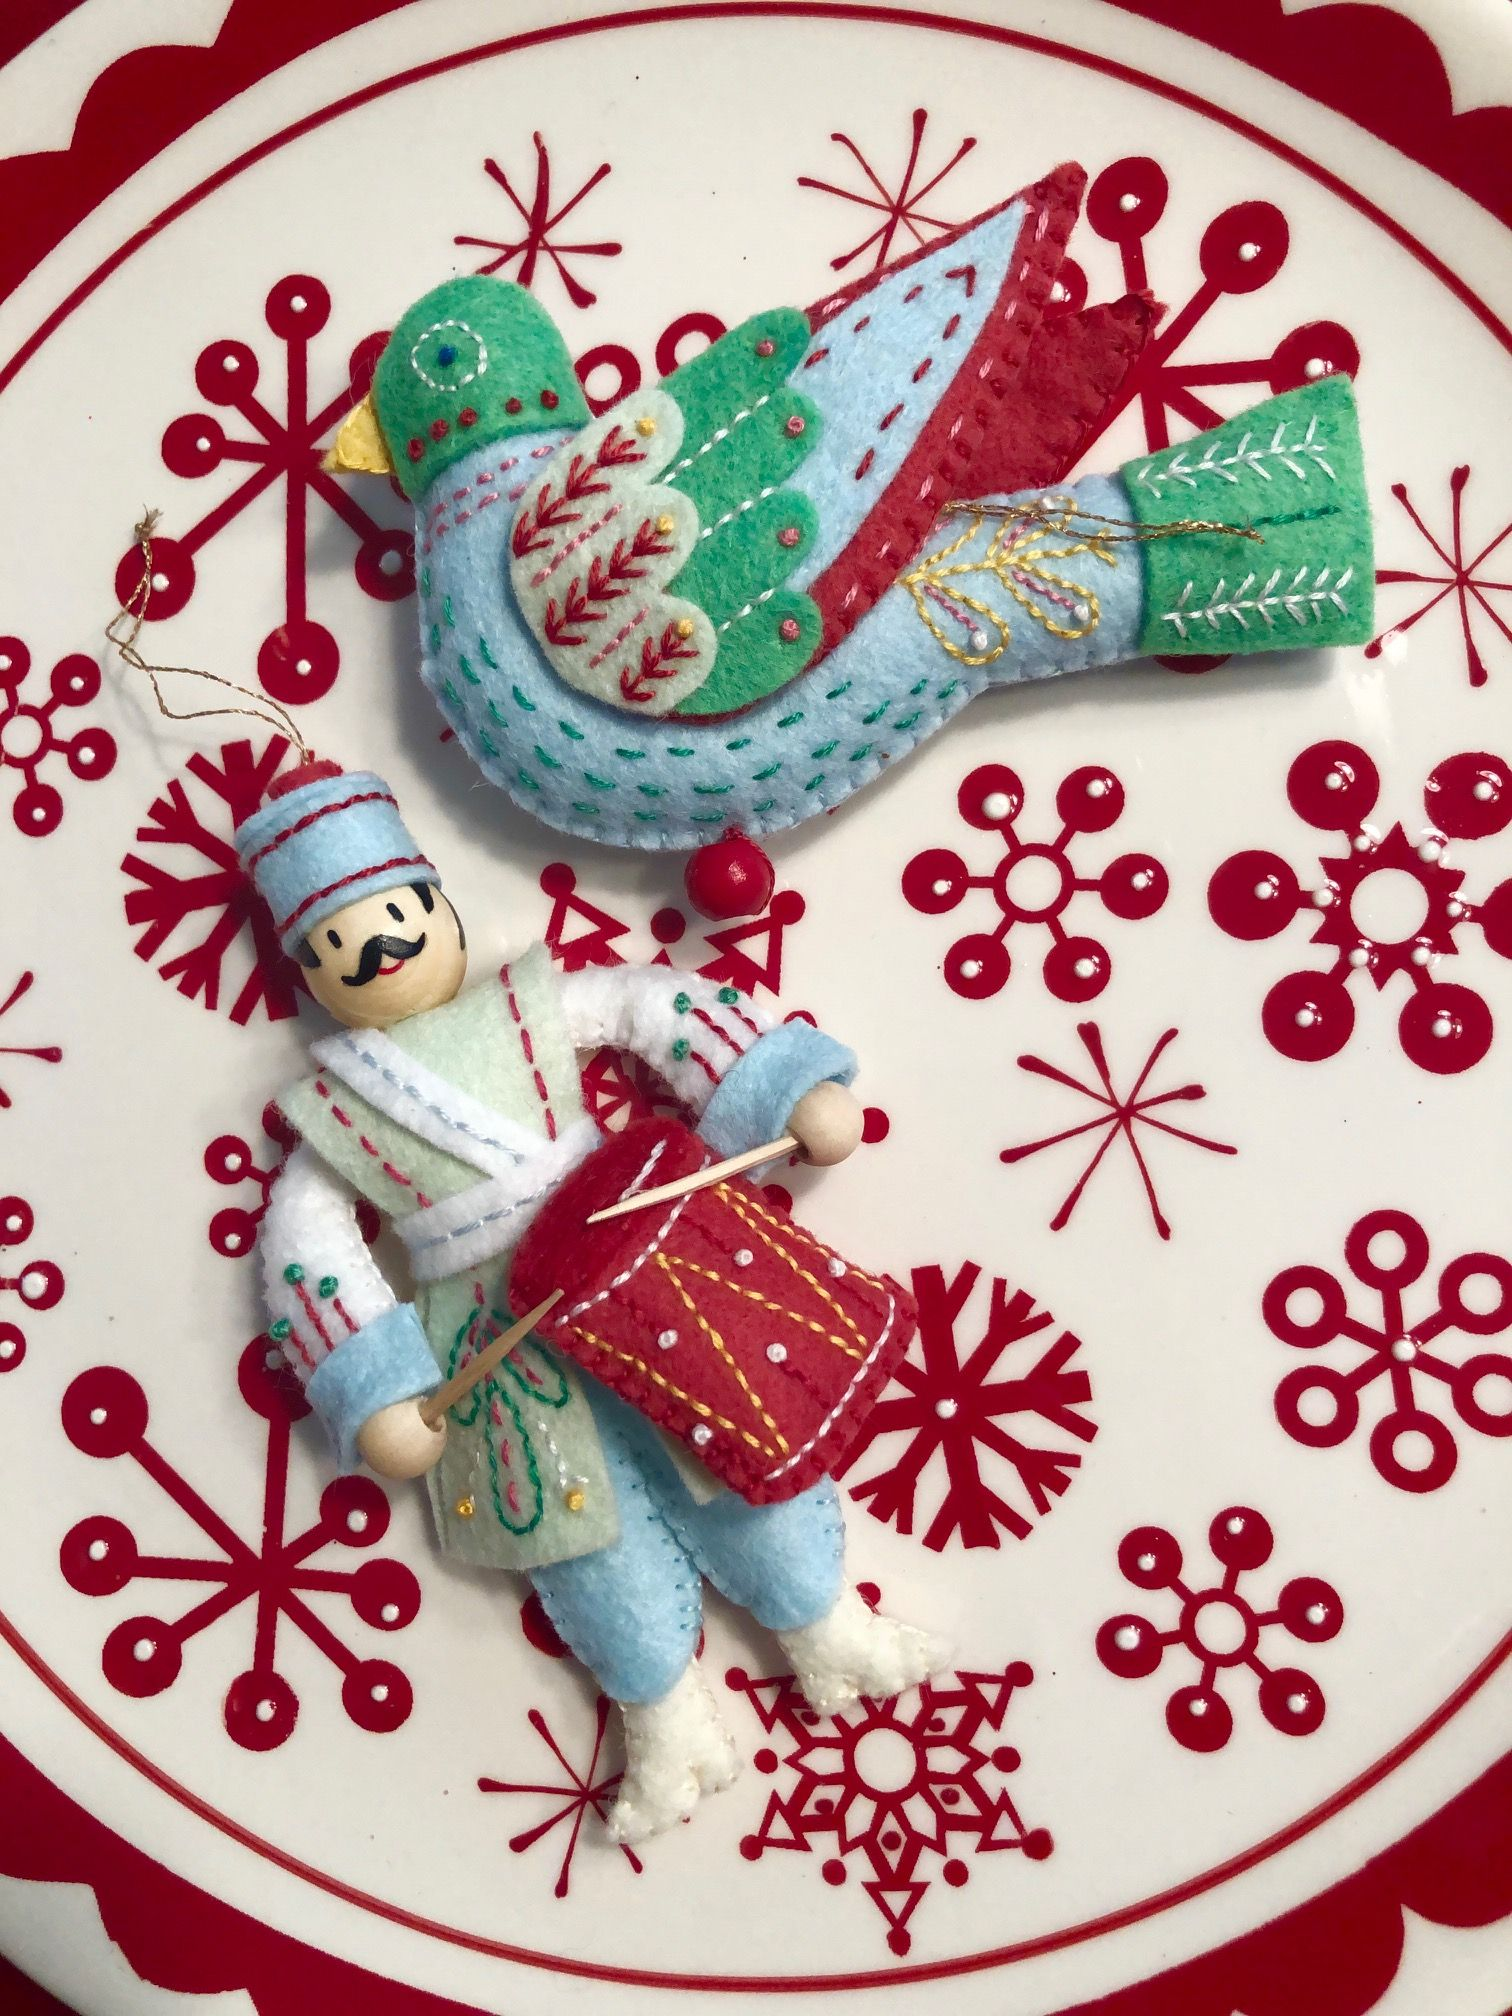 Woolfelt 12 Days Of Christmas Ornaments Felt Christmas Ornaments Felt Crafts Felt Ornaments